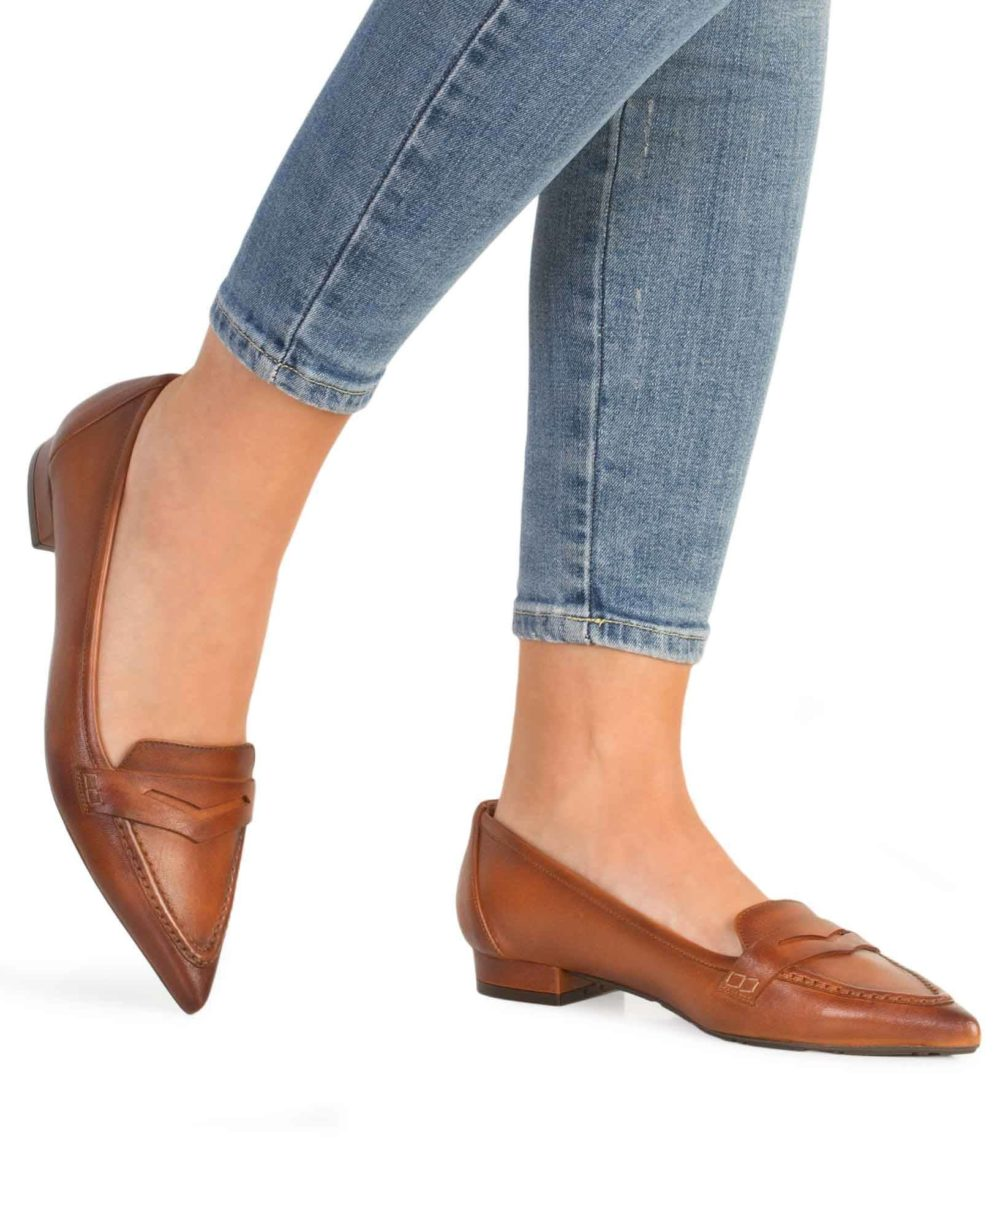 Zapatos de piel Paco Gil. P-3776X Tostado Napa Oily Piernas